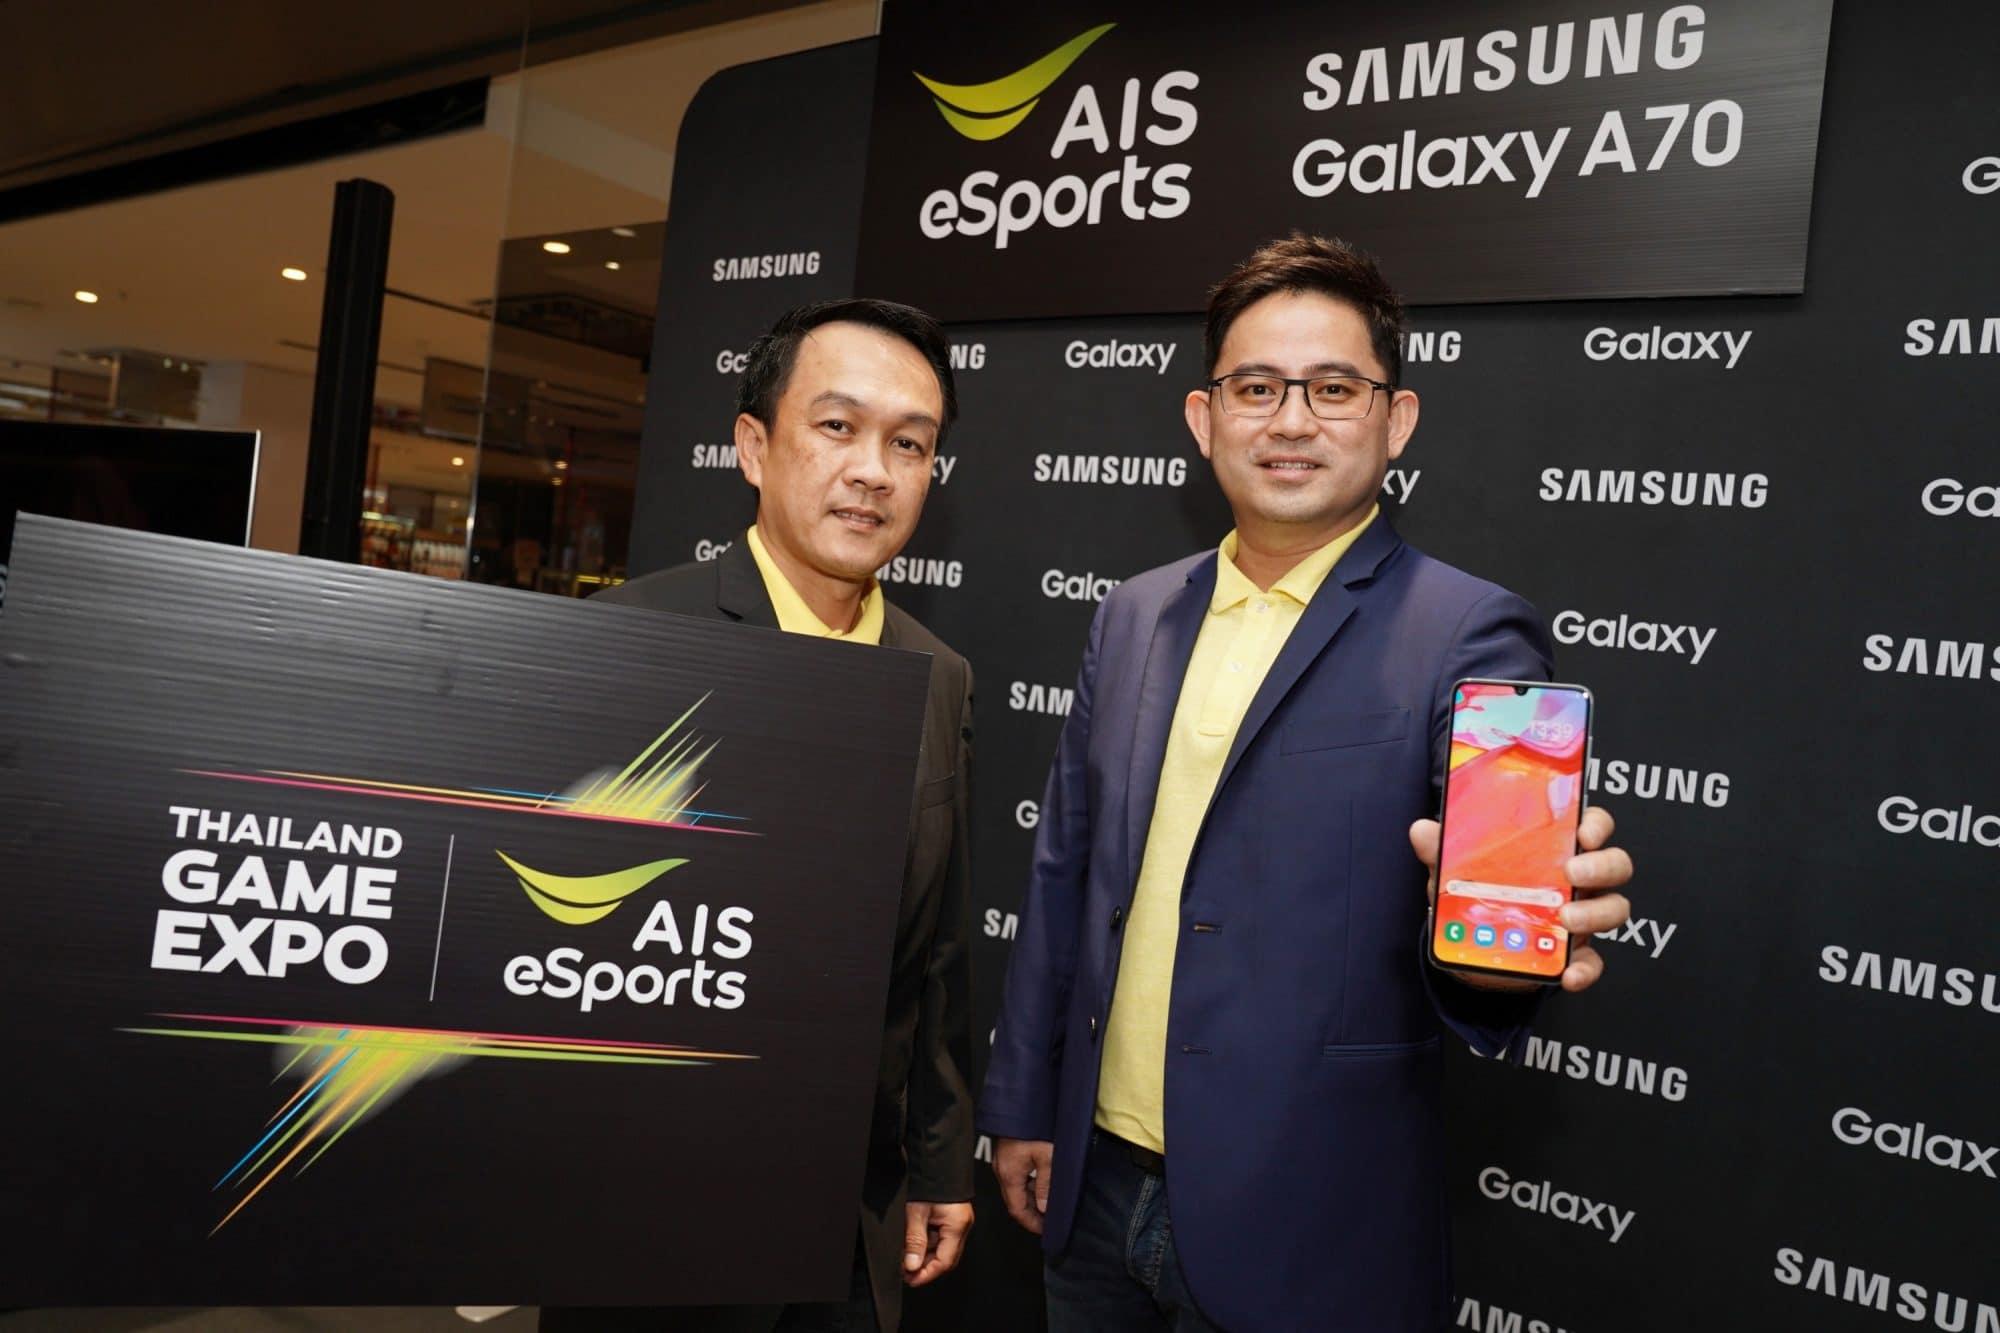 Samsung จับมือกับ AIS จัดกิจกรรม AIS x Samsung Galaxy A70 eSports พร้อมโปรสุดพิเศษ 2